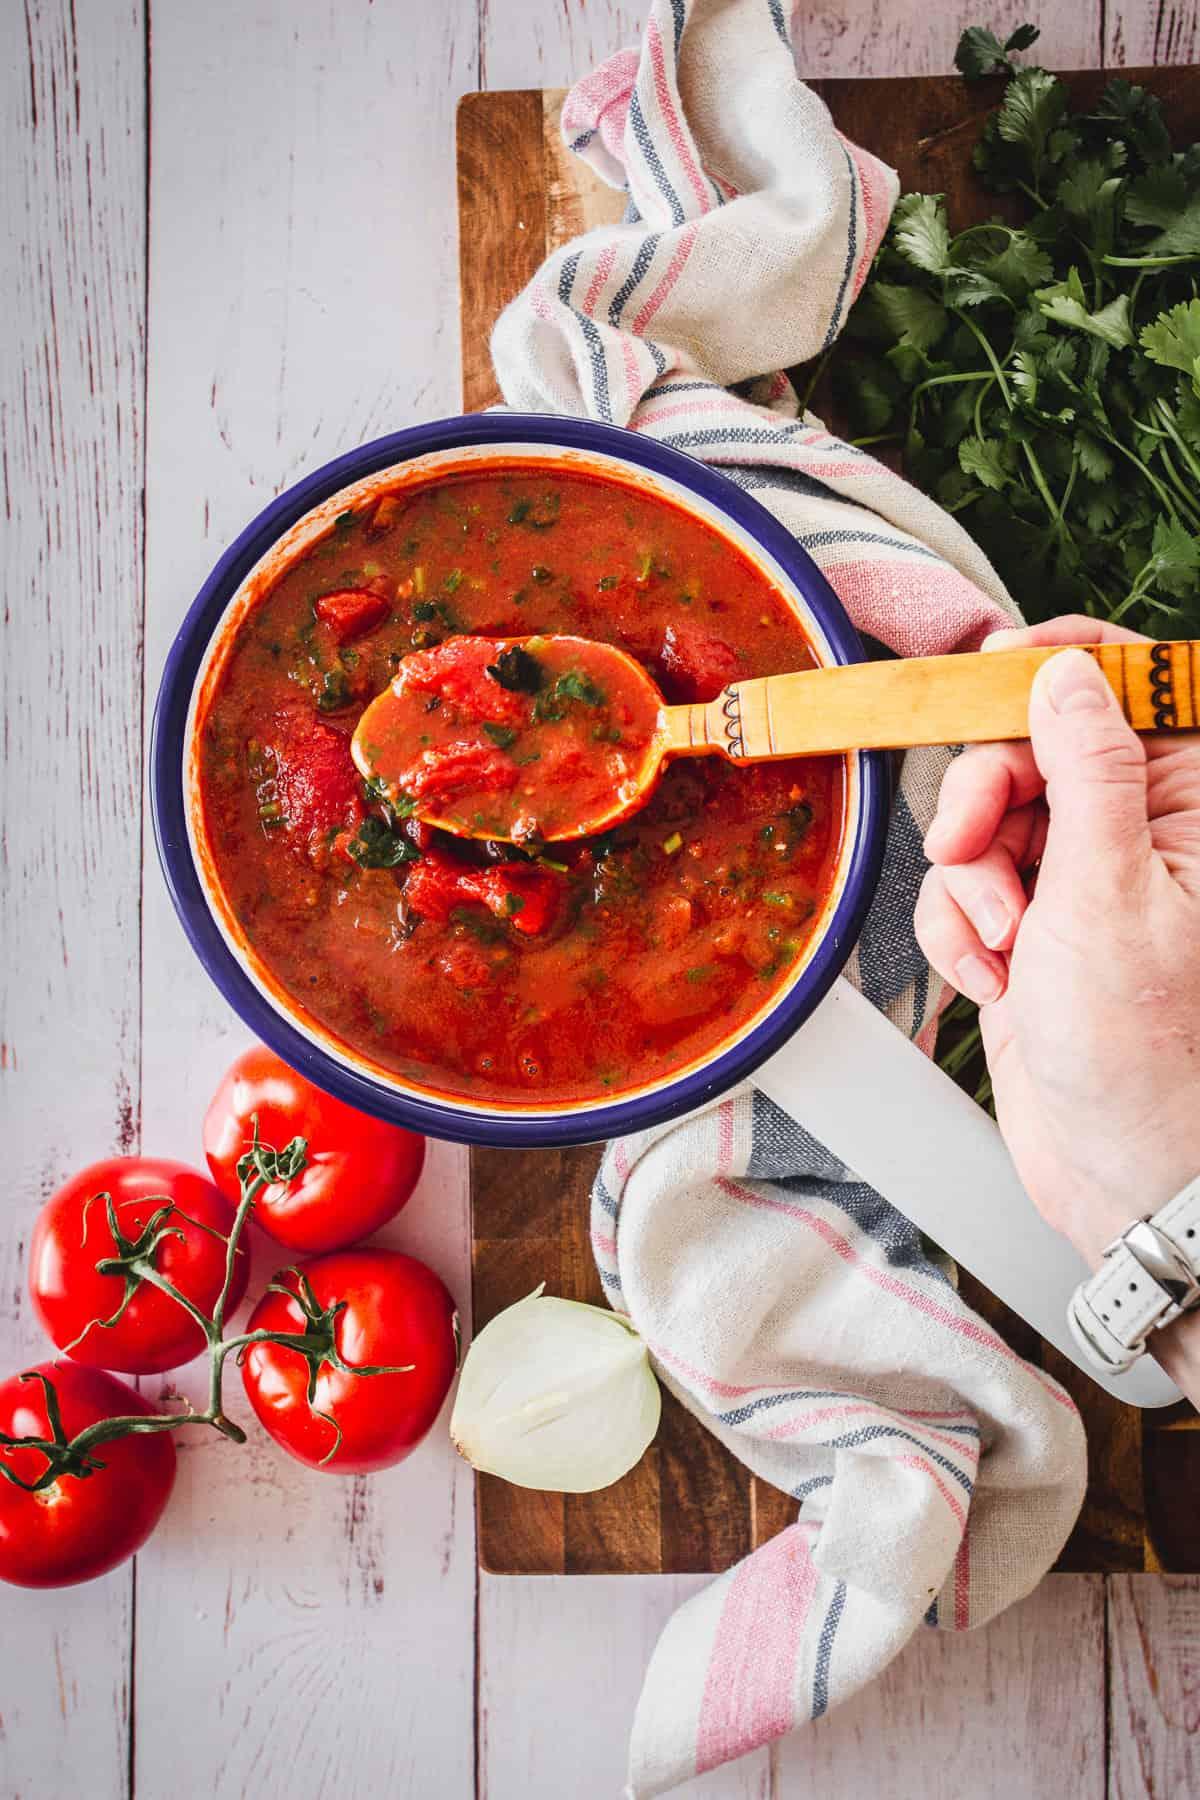 hand mixing tomato sauce